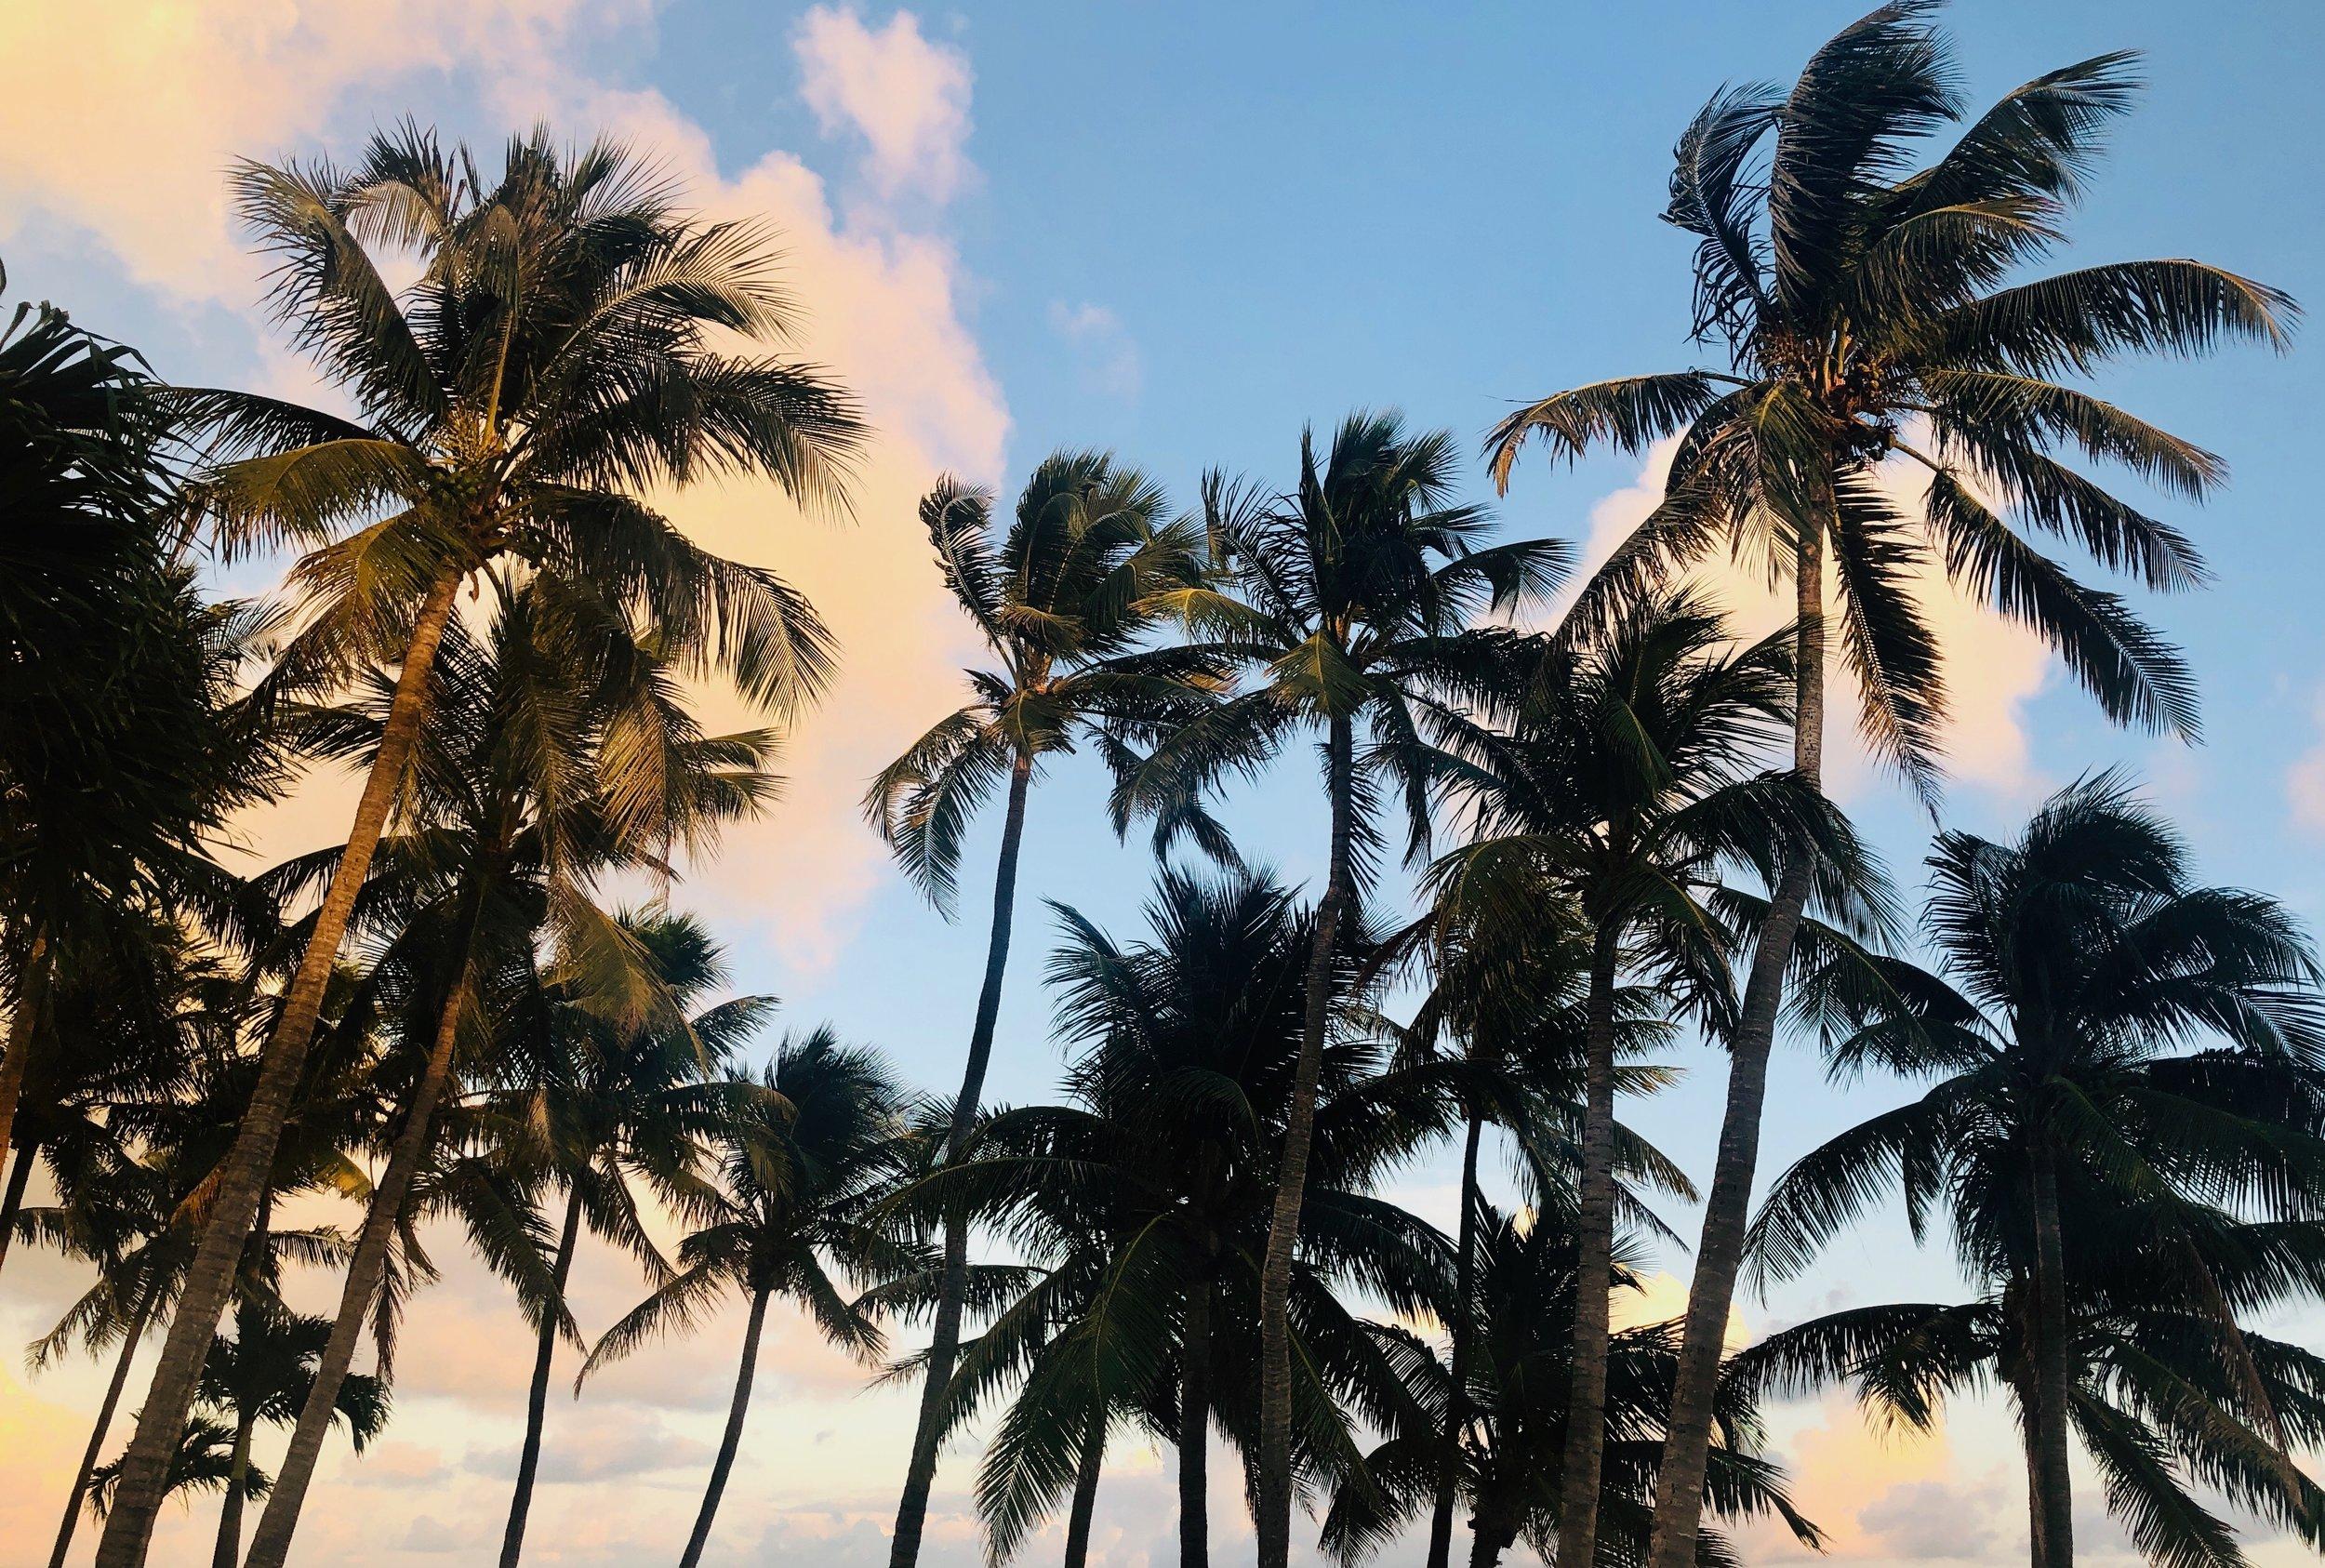 An abundance of palm trees in Islamorada.